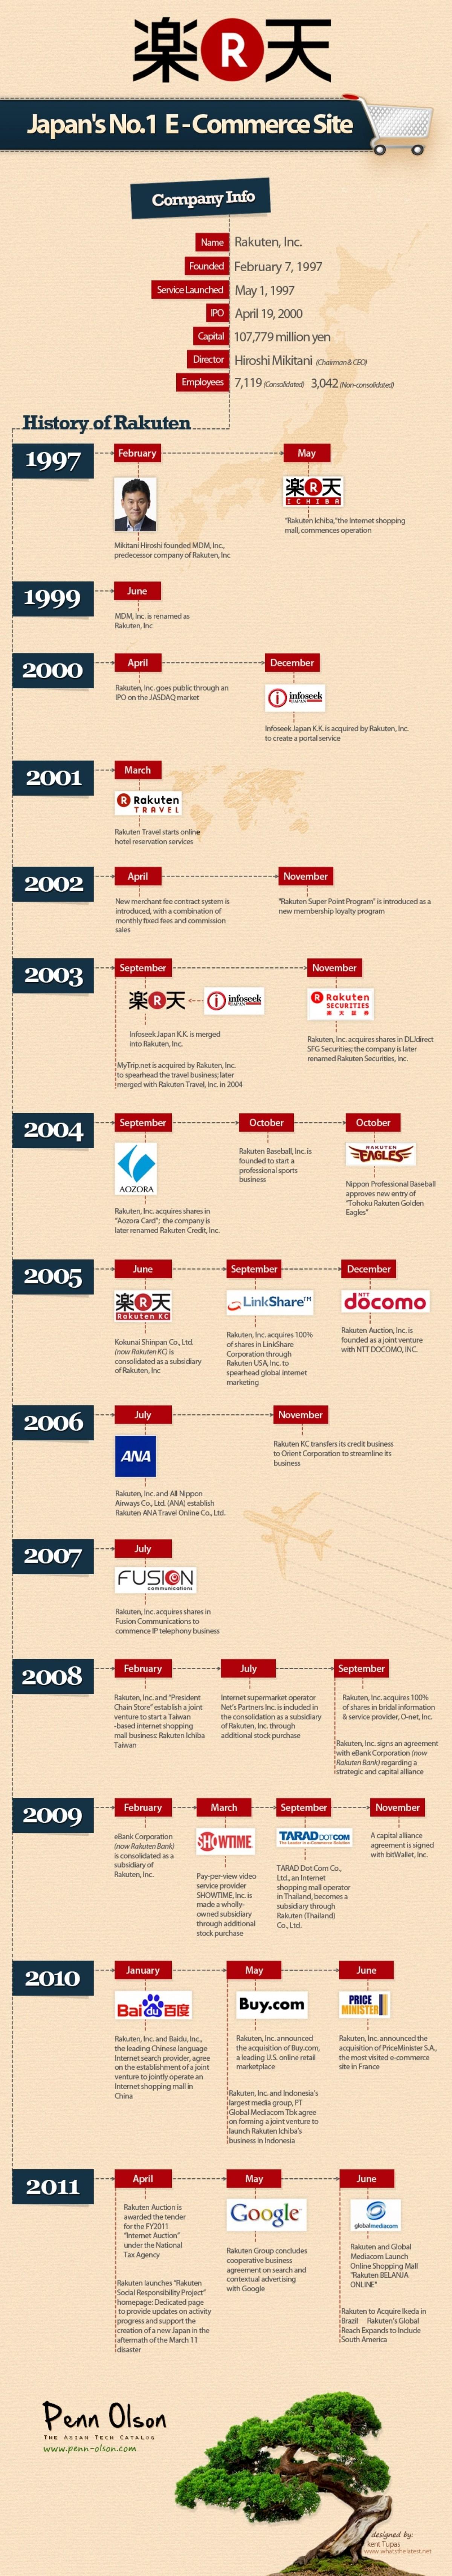 The History of Rakuten, Japan's Largest E-Commerce Site